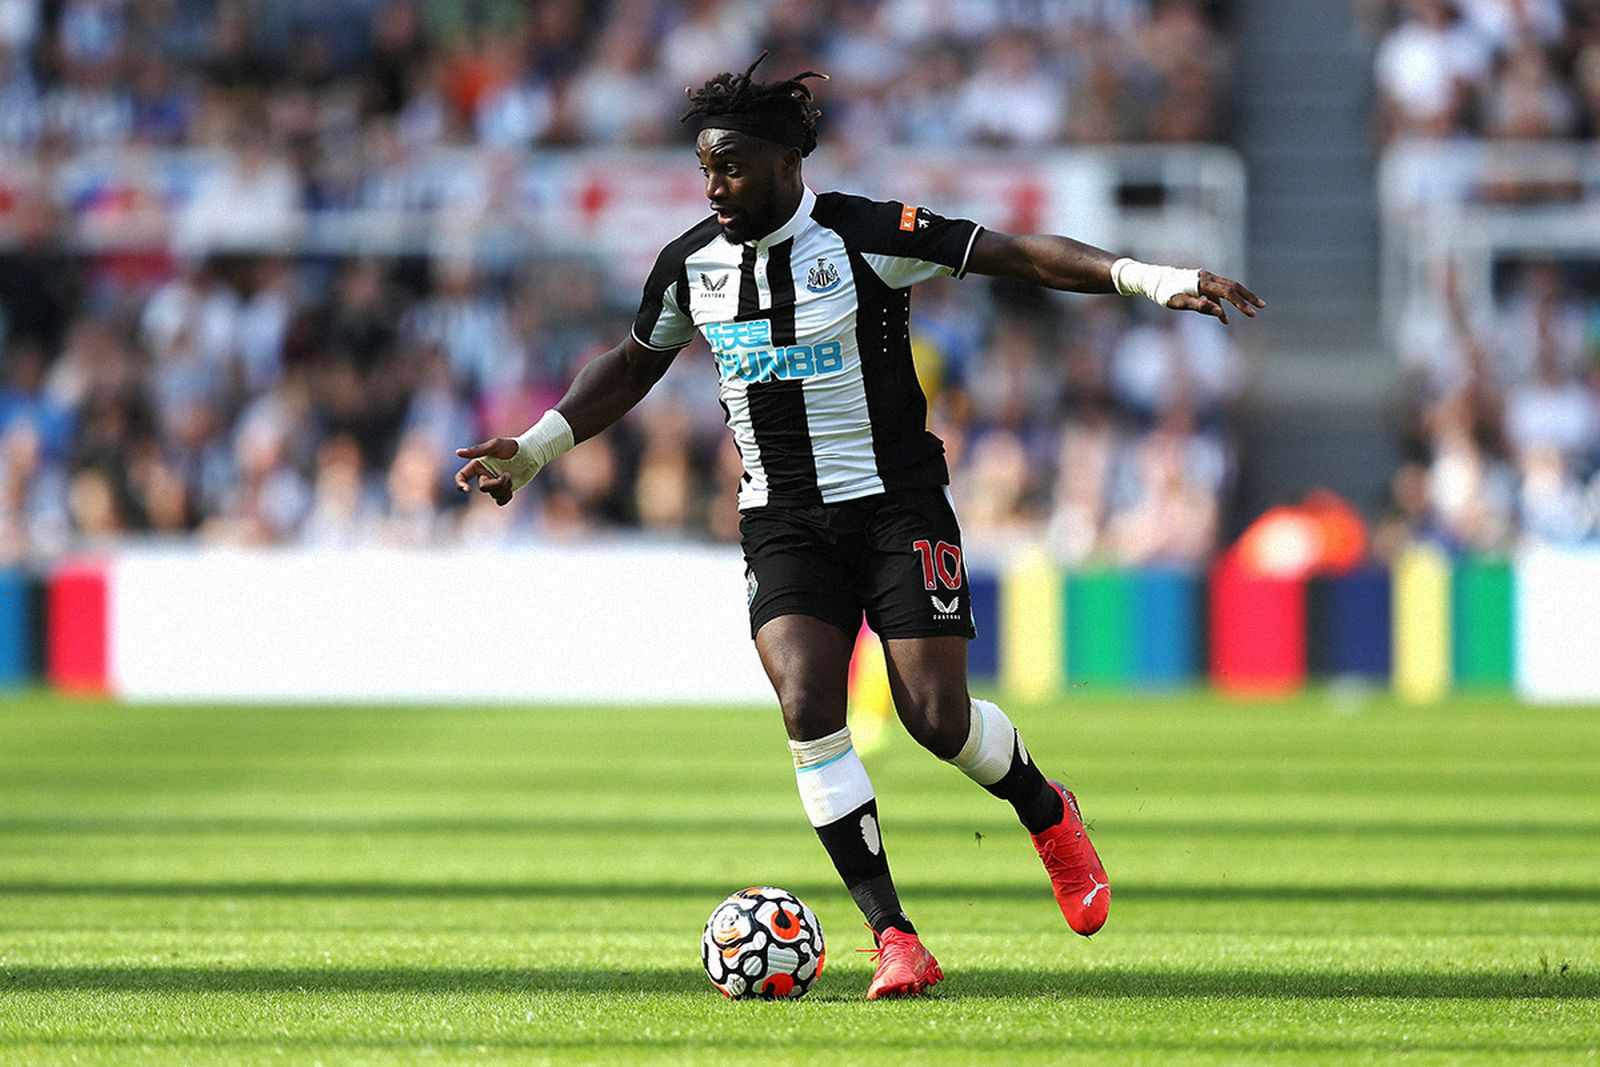 Newcastle's precious asset Allan Saint-Maximin on the ball